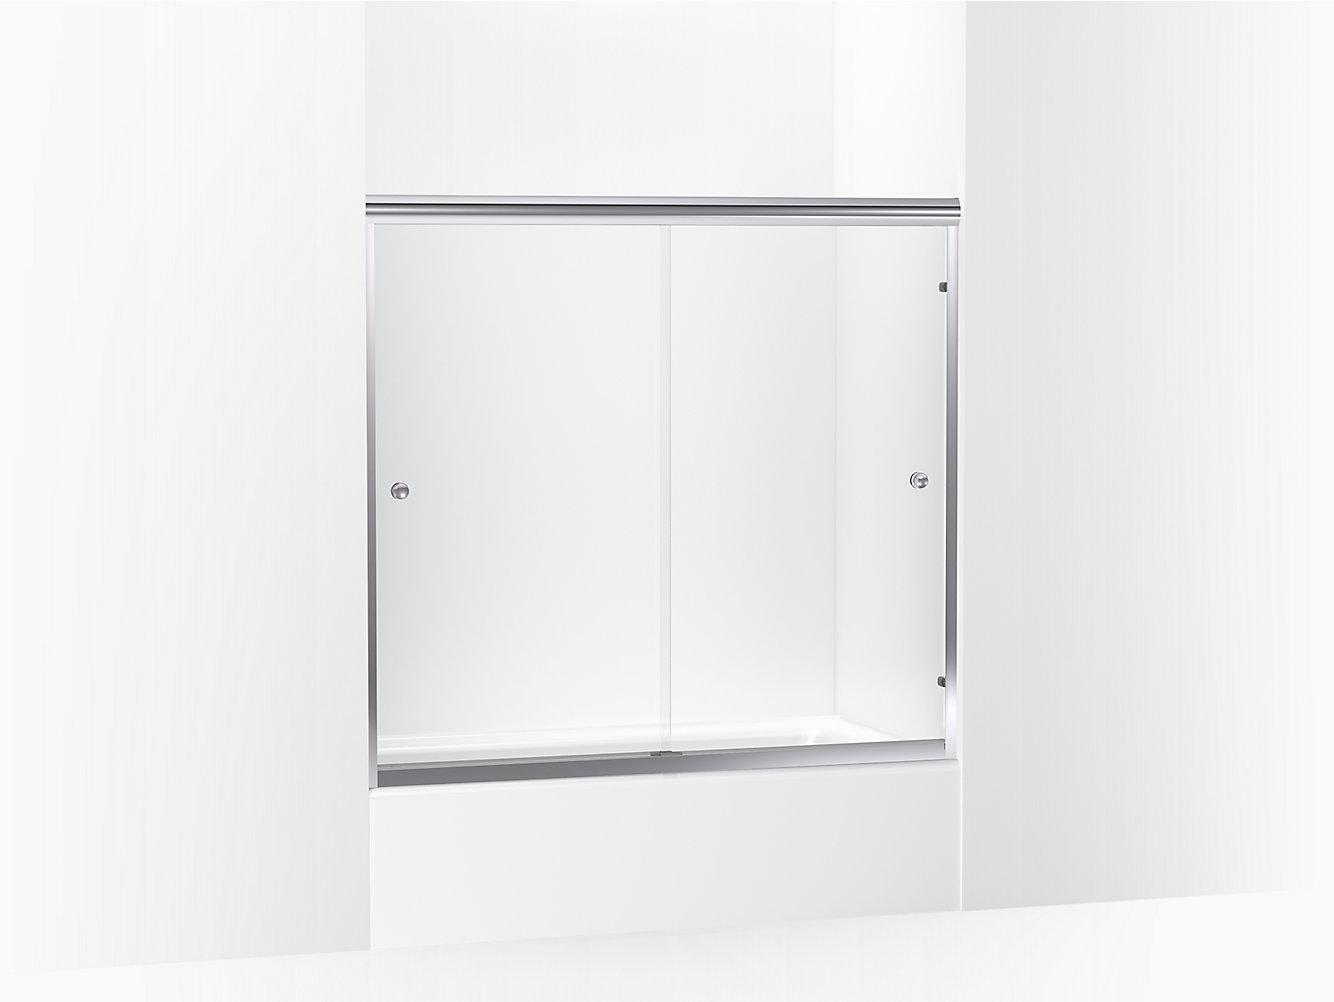 Finesse Frameless Sliding Bath Door 54 5 8 59 5 8 W X 55 3 16 H 5427 59s G05 Sterling